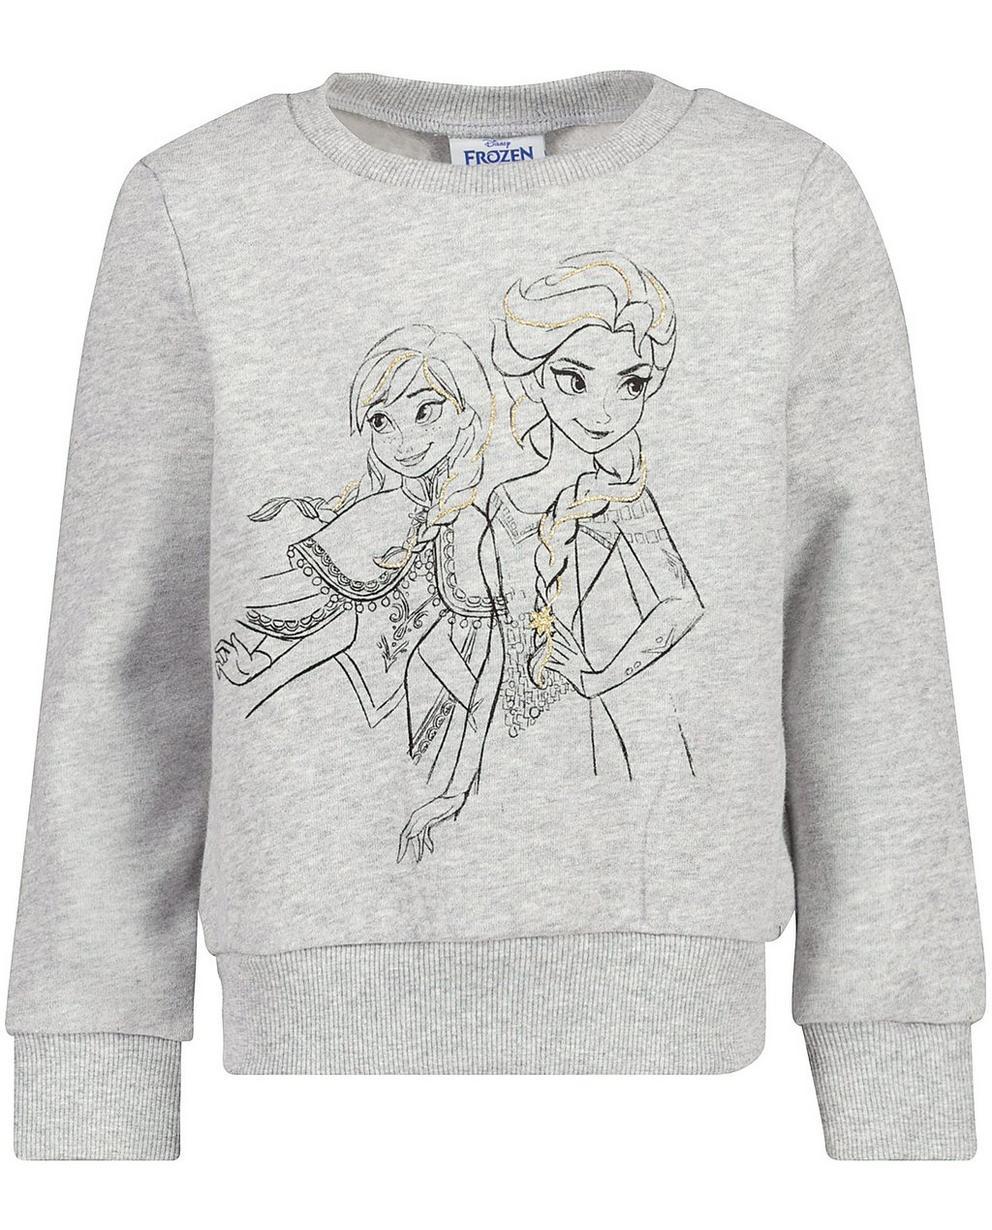 Sweater - Blassgrau - Grauer Sweater